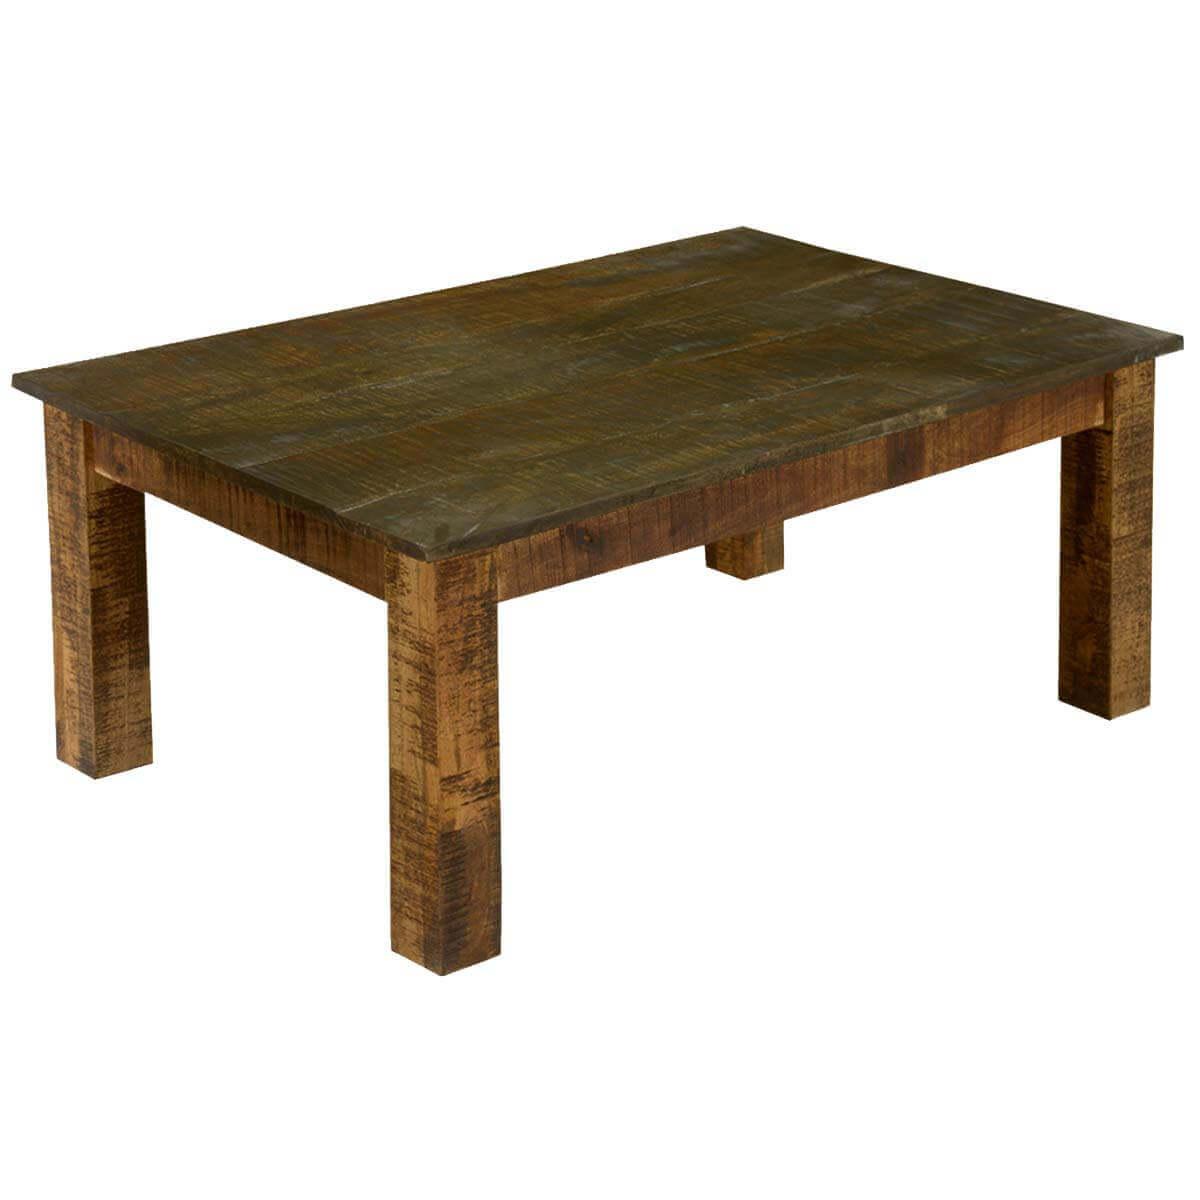 Pioneer Rustic Solid Mango Wood Textured Coffee Table